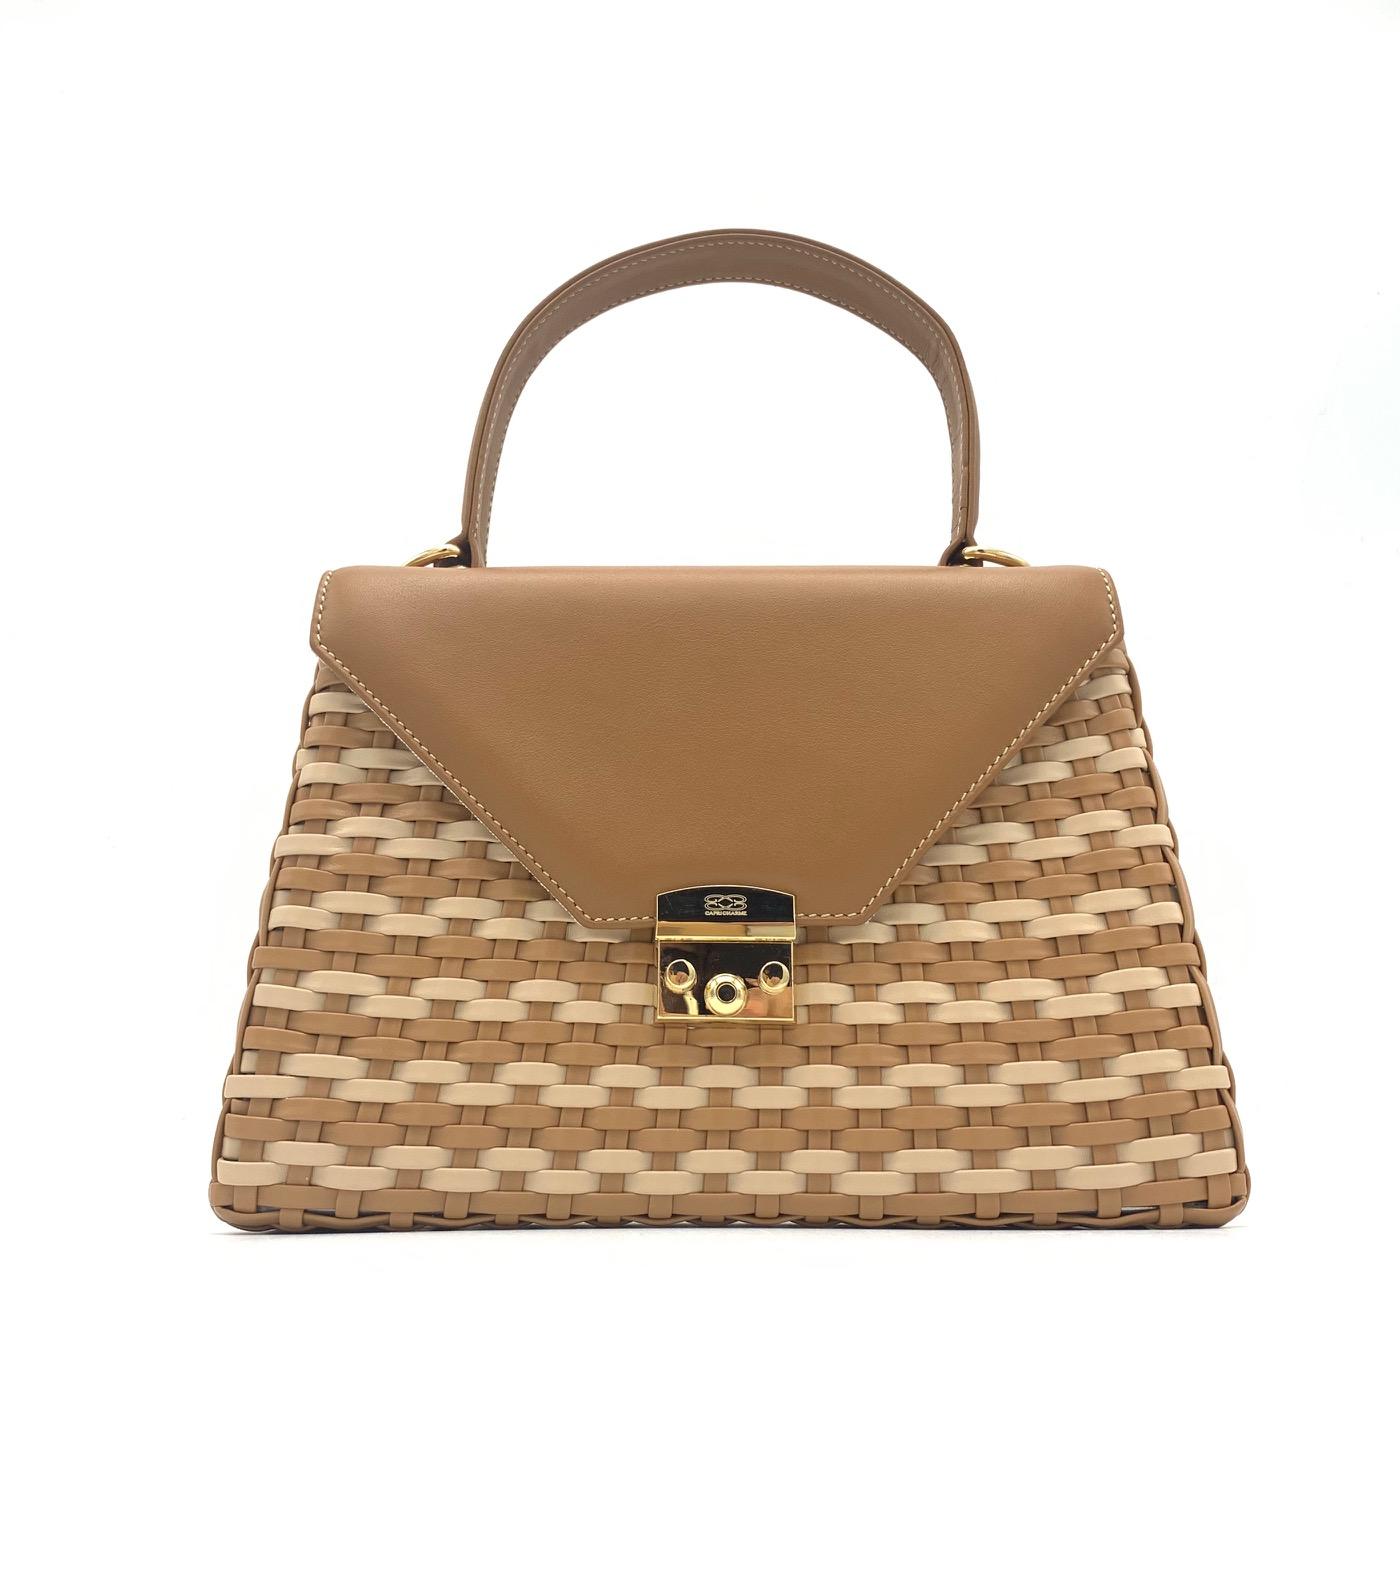 Capri handbag in woven calf leather/toffee